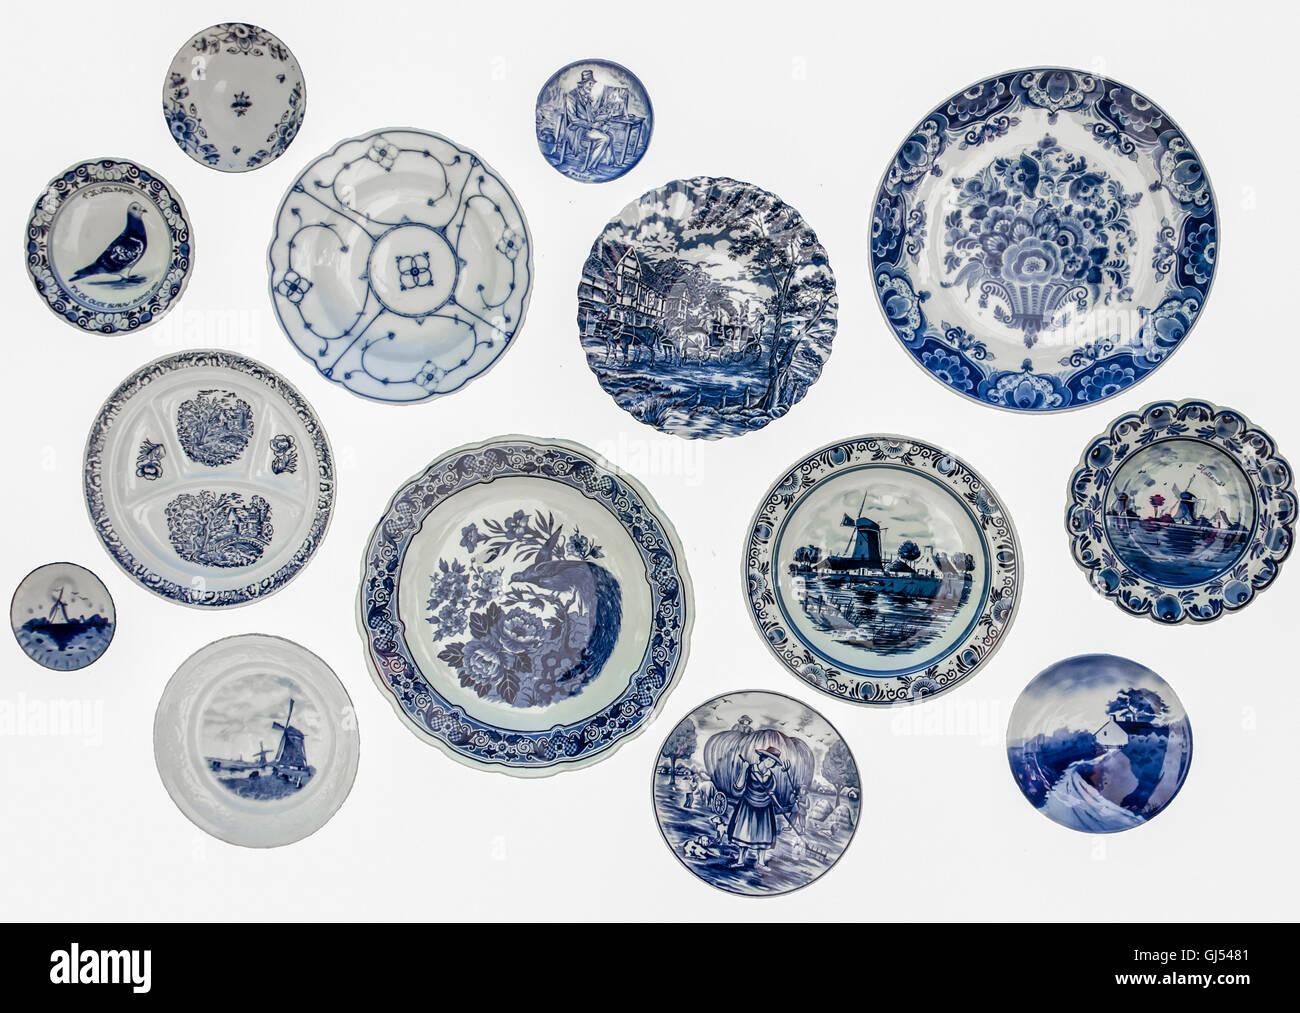 Decorative plates from Holland. Dutch souvenir plates on the wall  sc 1 st  Alamy & Decorative plates from Holland. Dutch souvenir plates on the wall ...